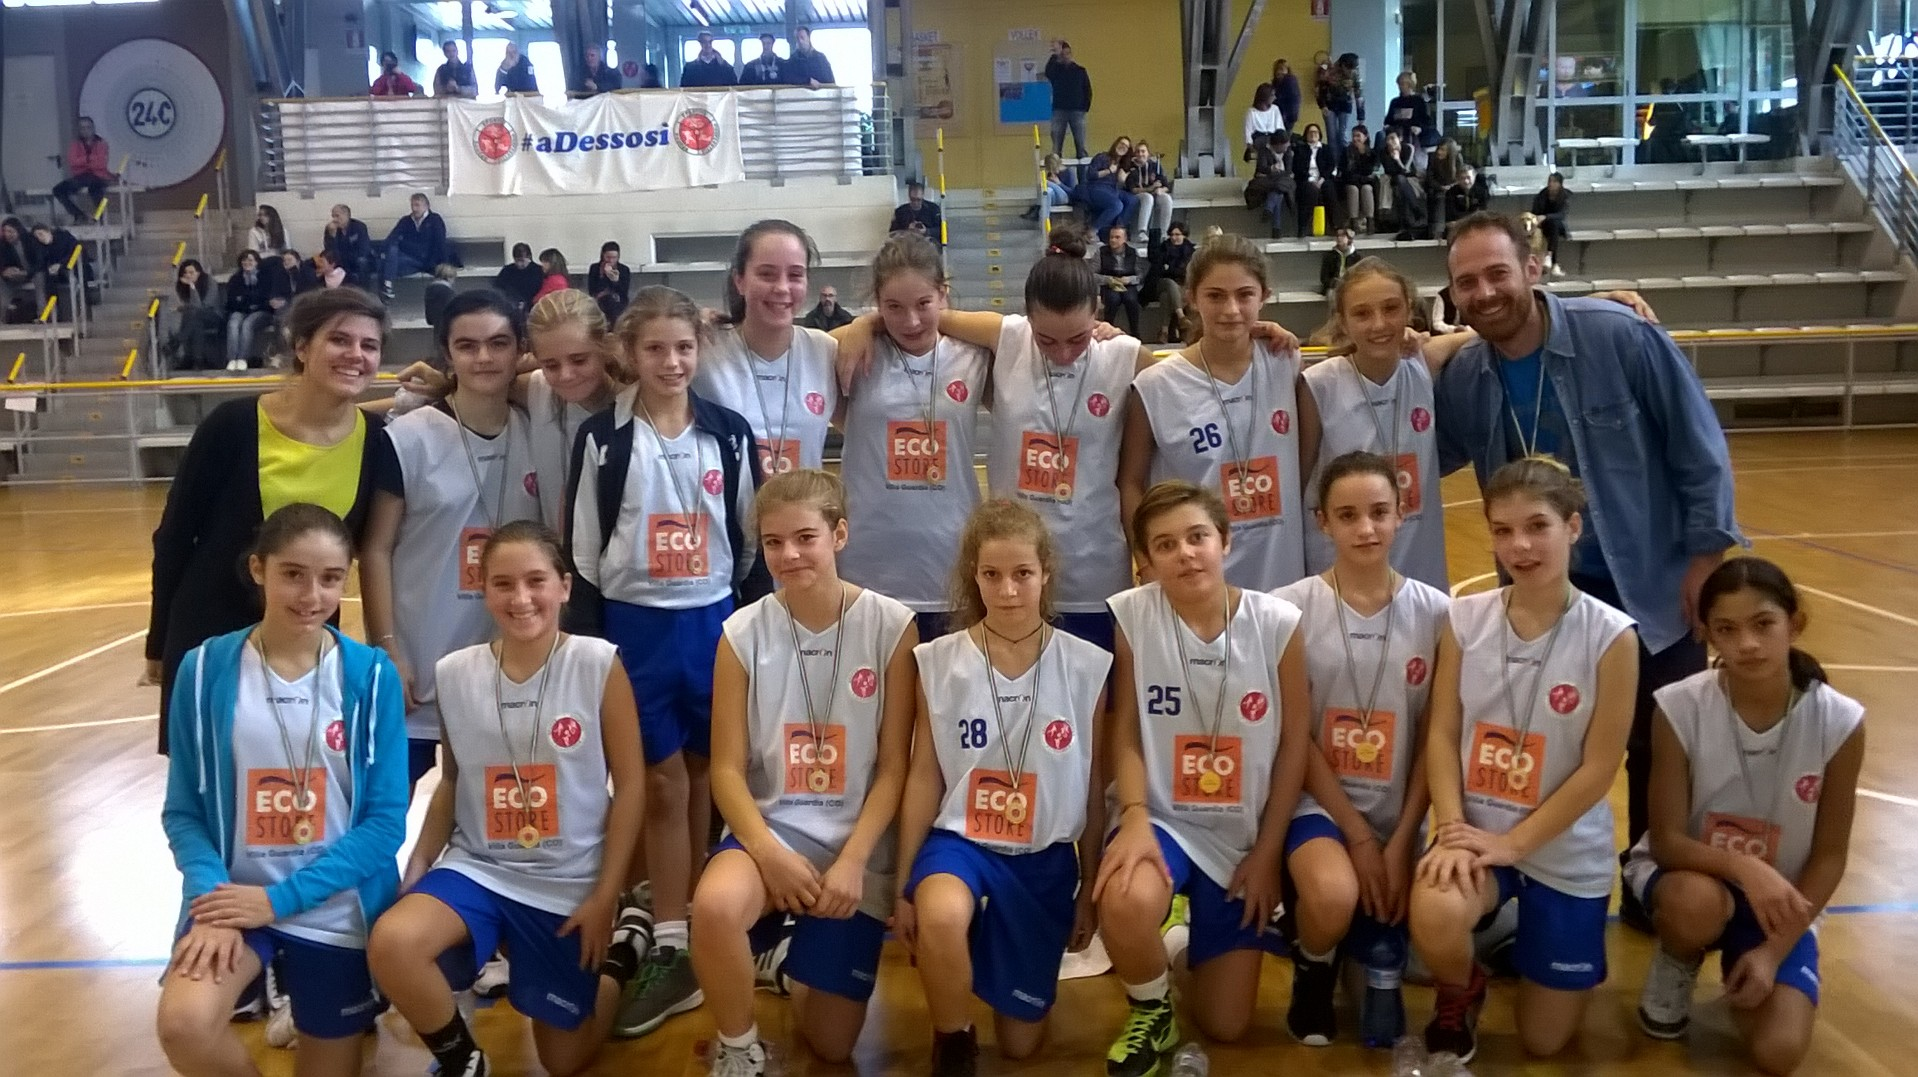 Basket - Under 13 F - Torneo Femminile - G.S.VILLA GUARDIA ed4dd1c12b1f